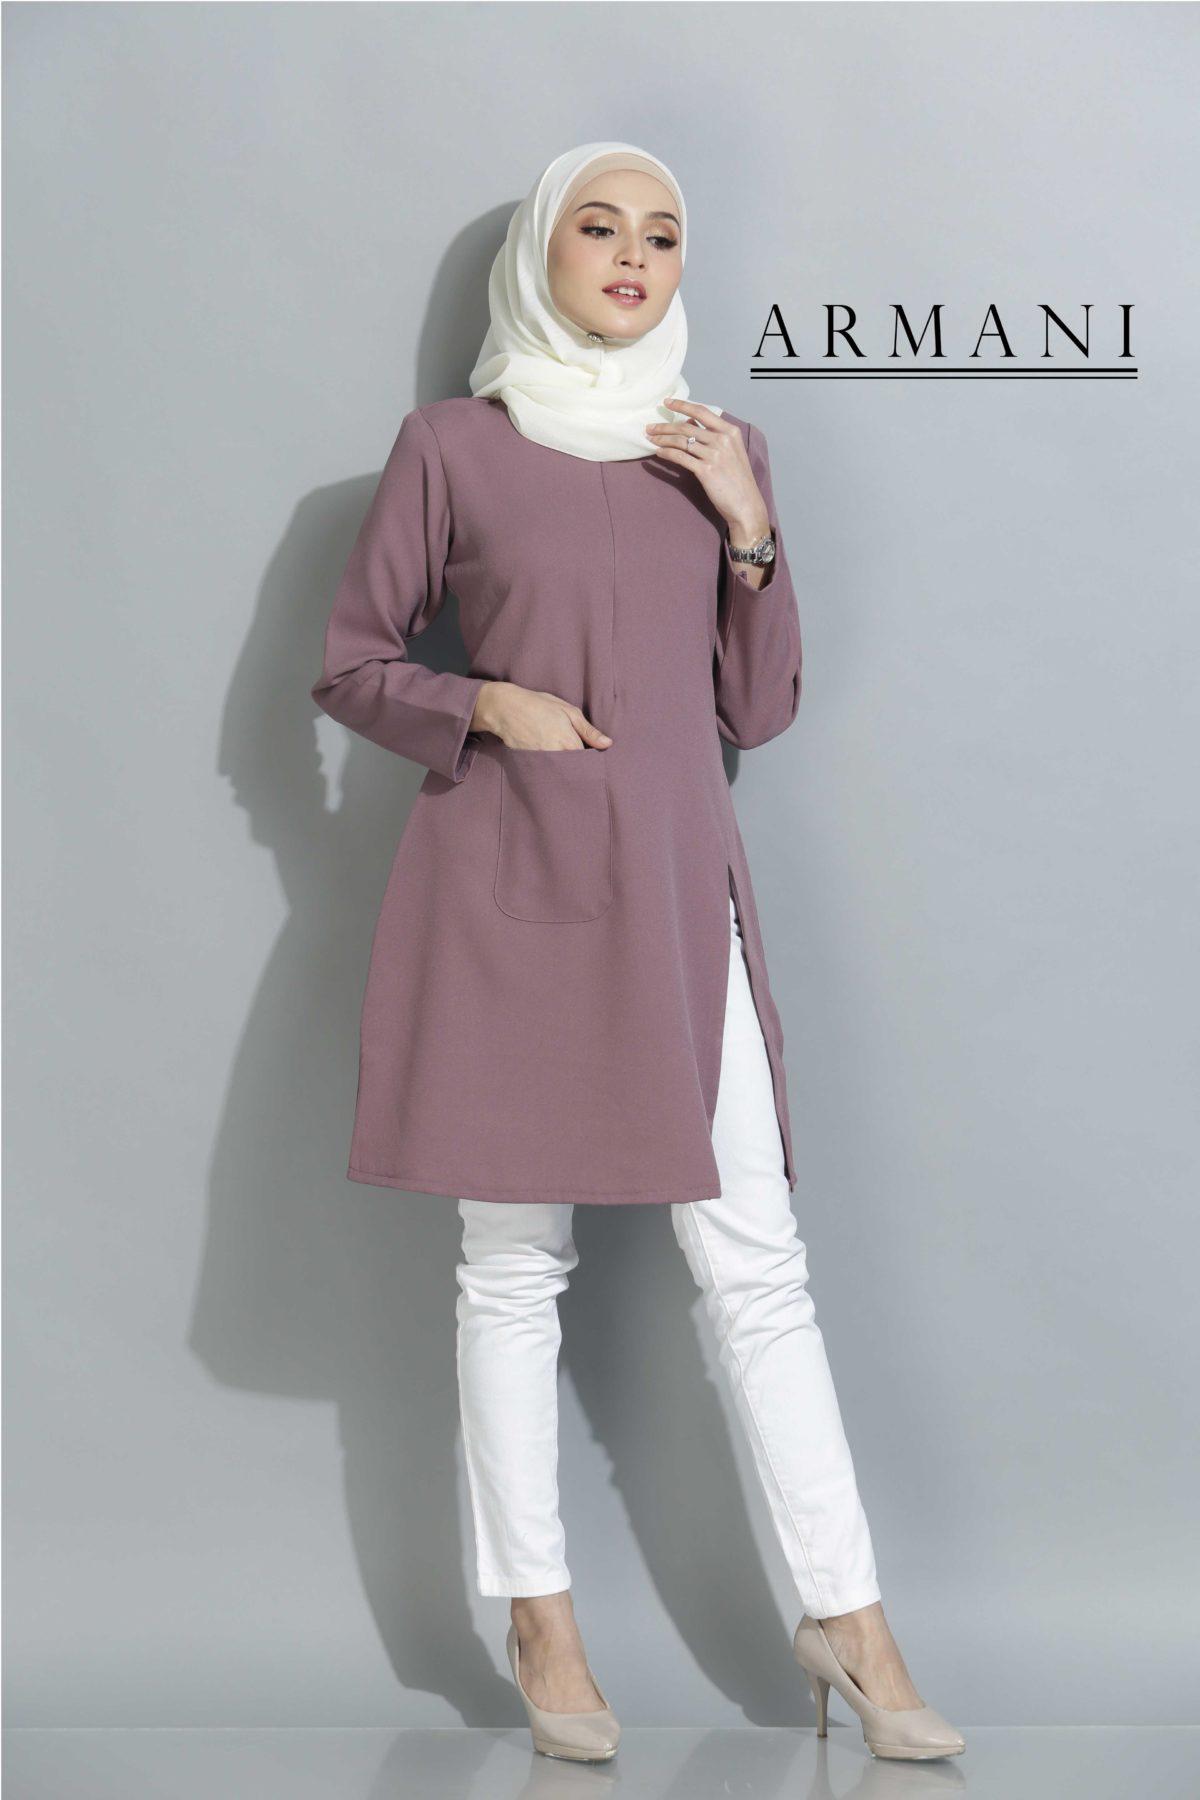 Armani Plum